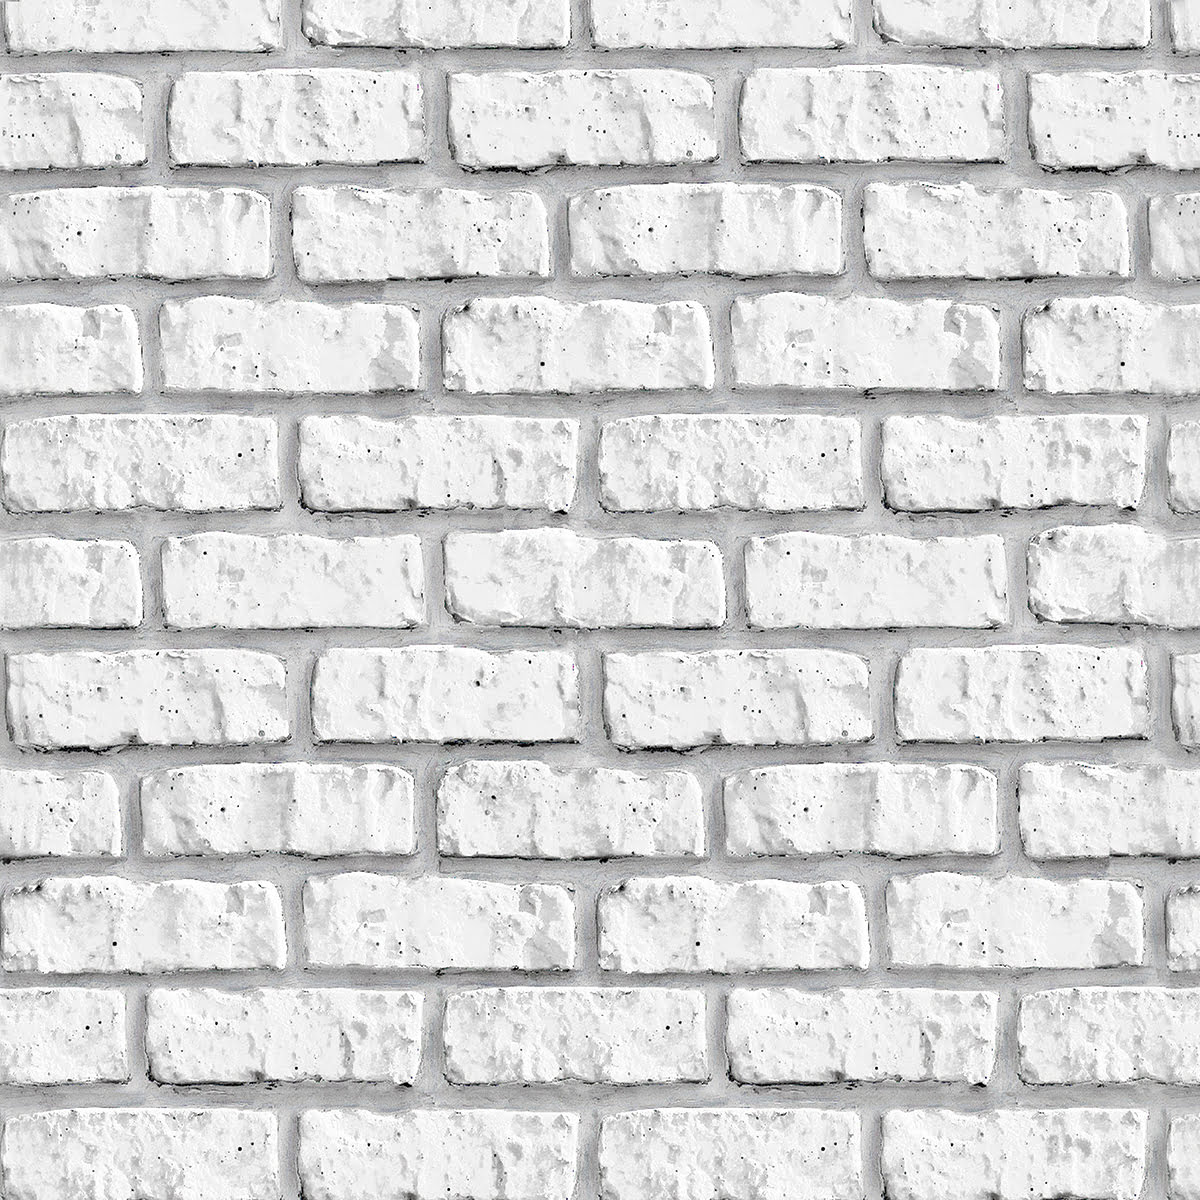 Rolo Adesivo Tijolo Branco